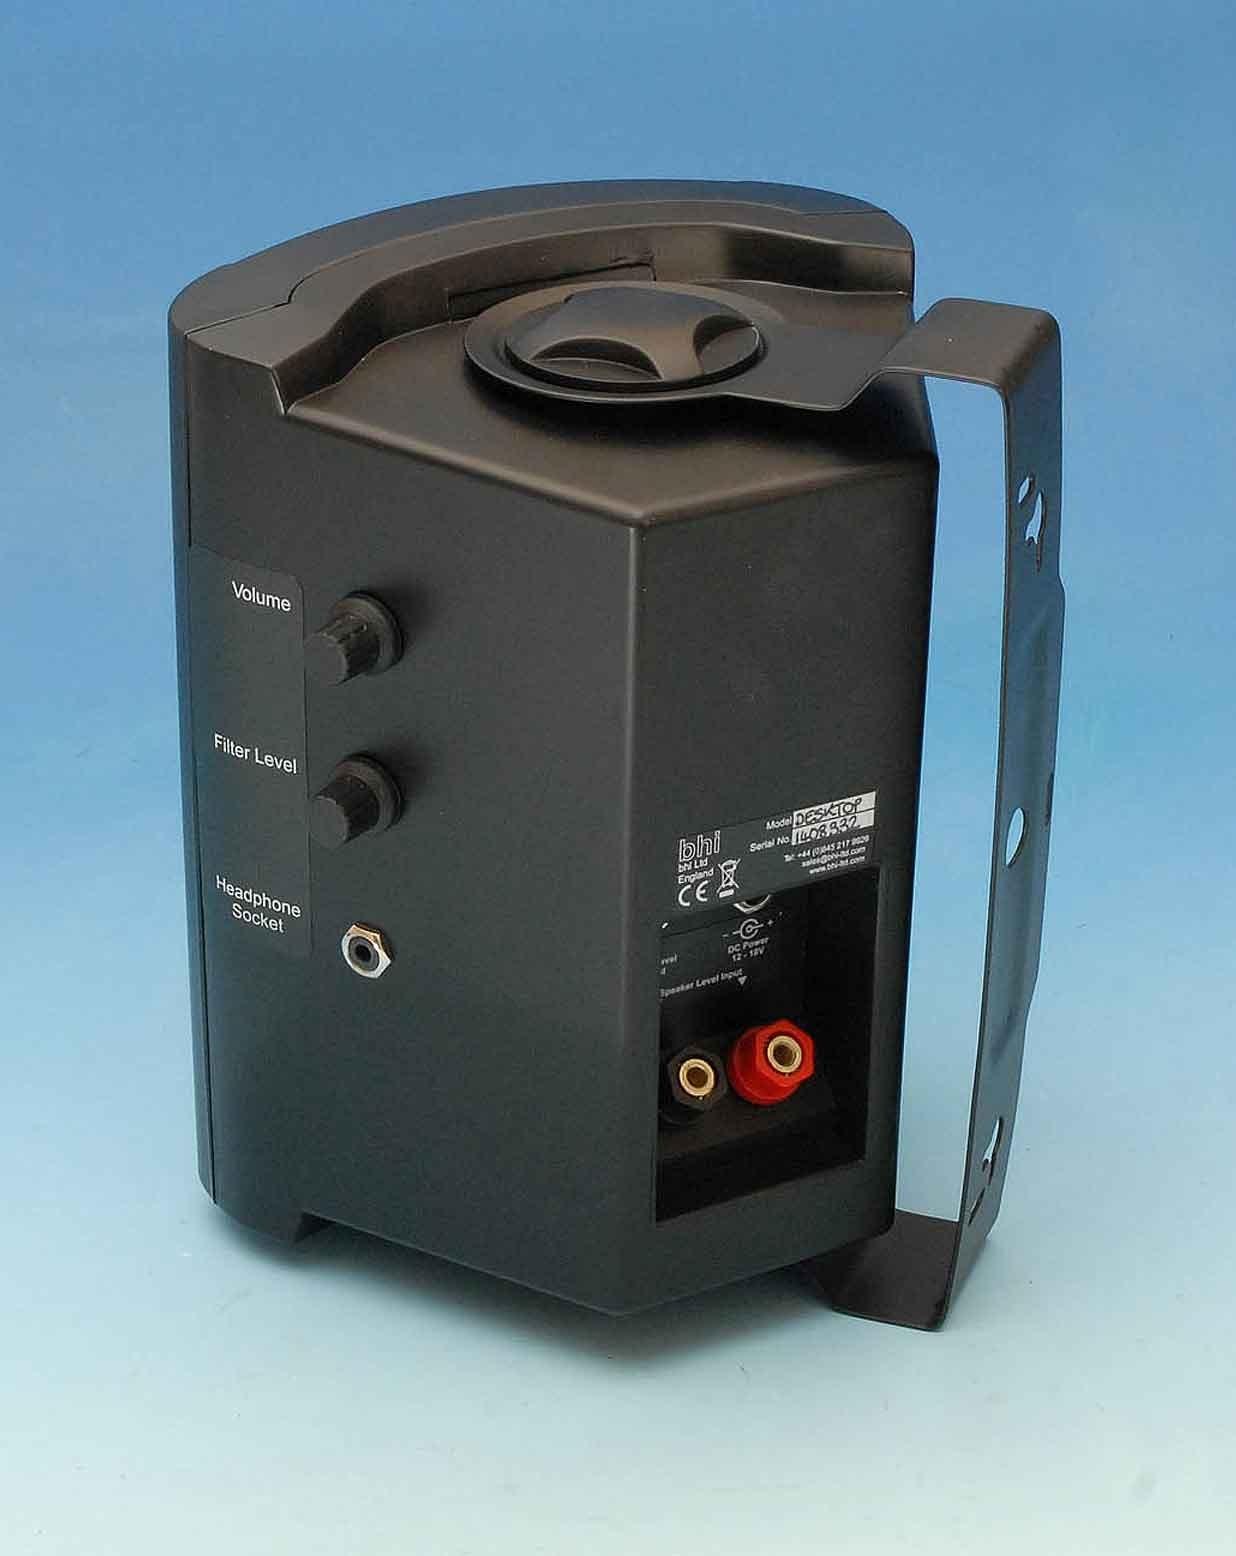 DESKTOP 10 watt DSP noise cancelling base station speaker